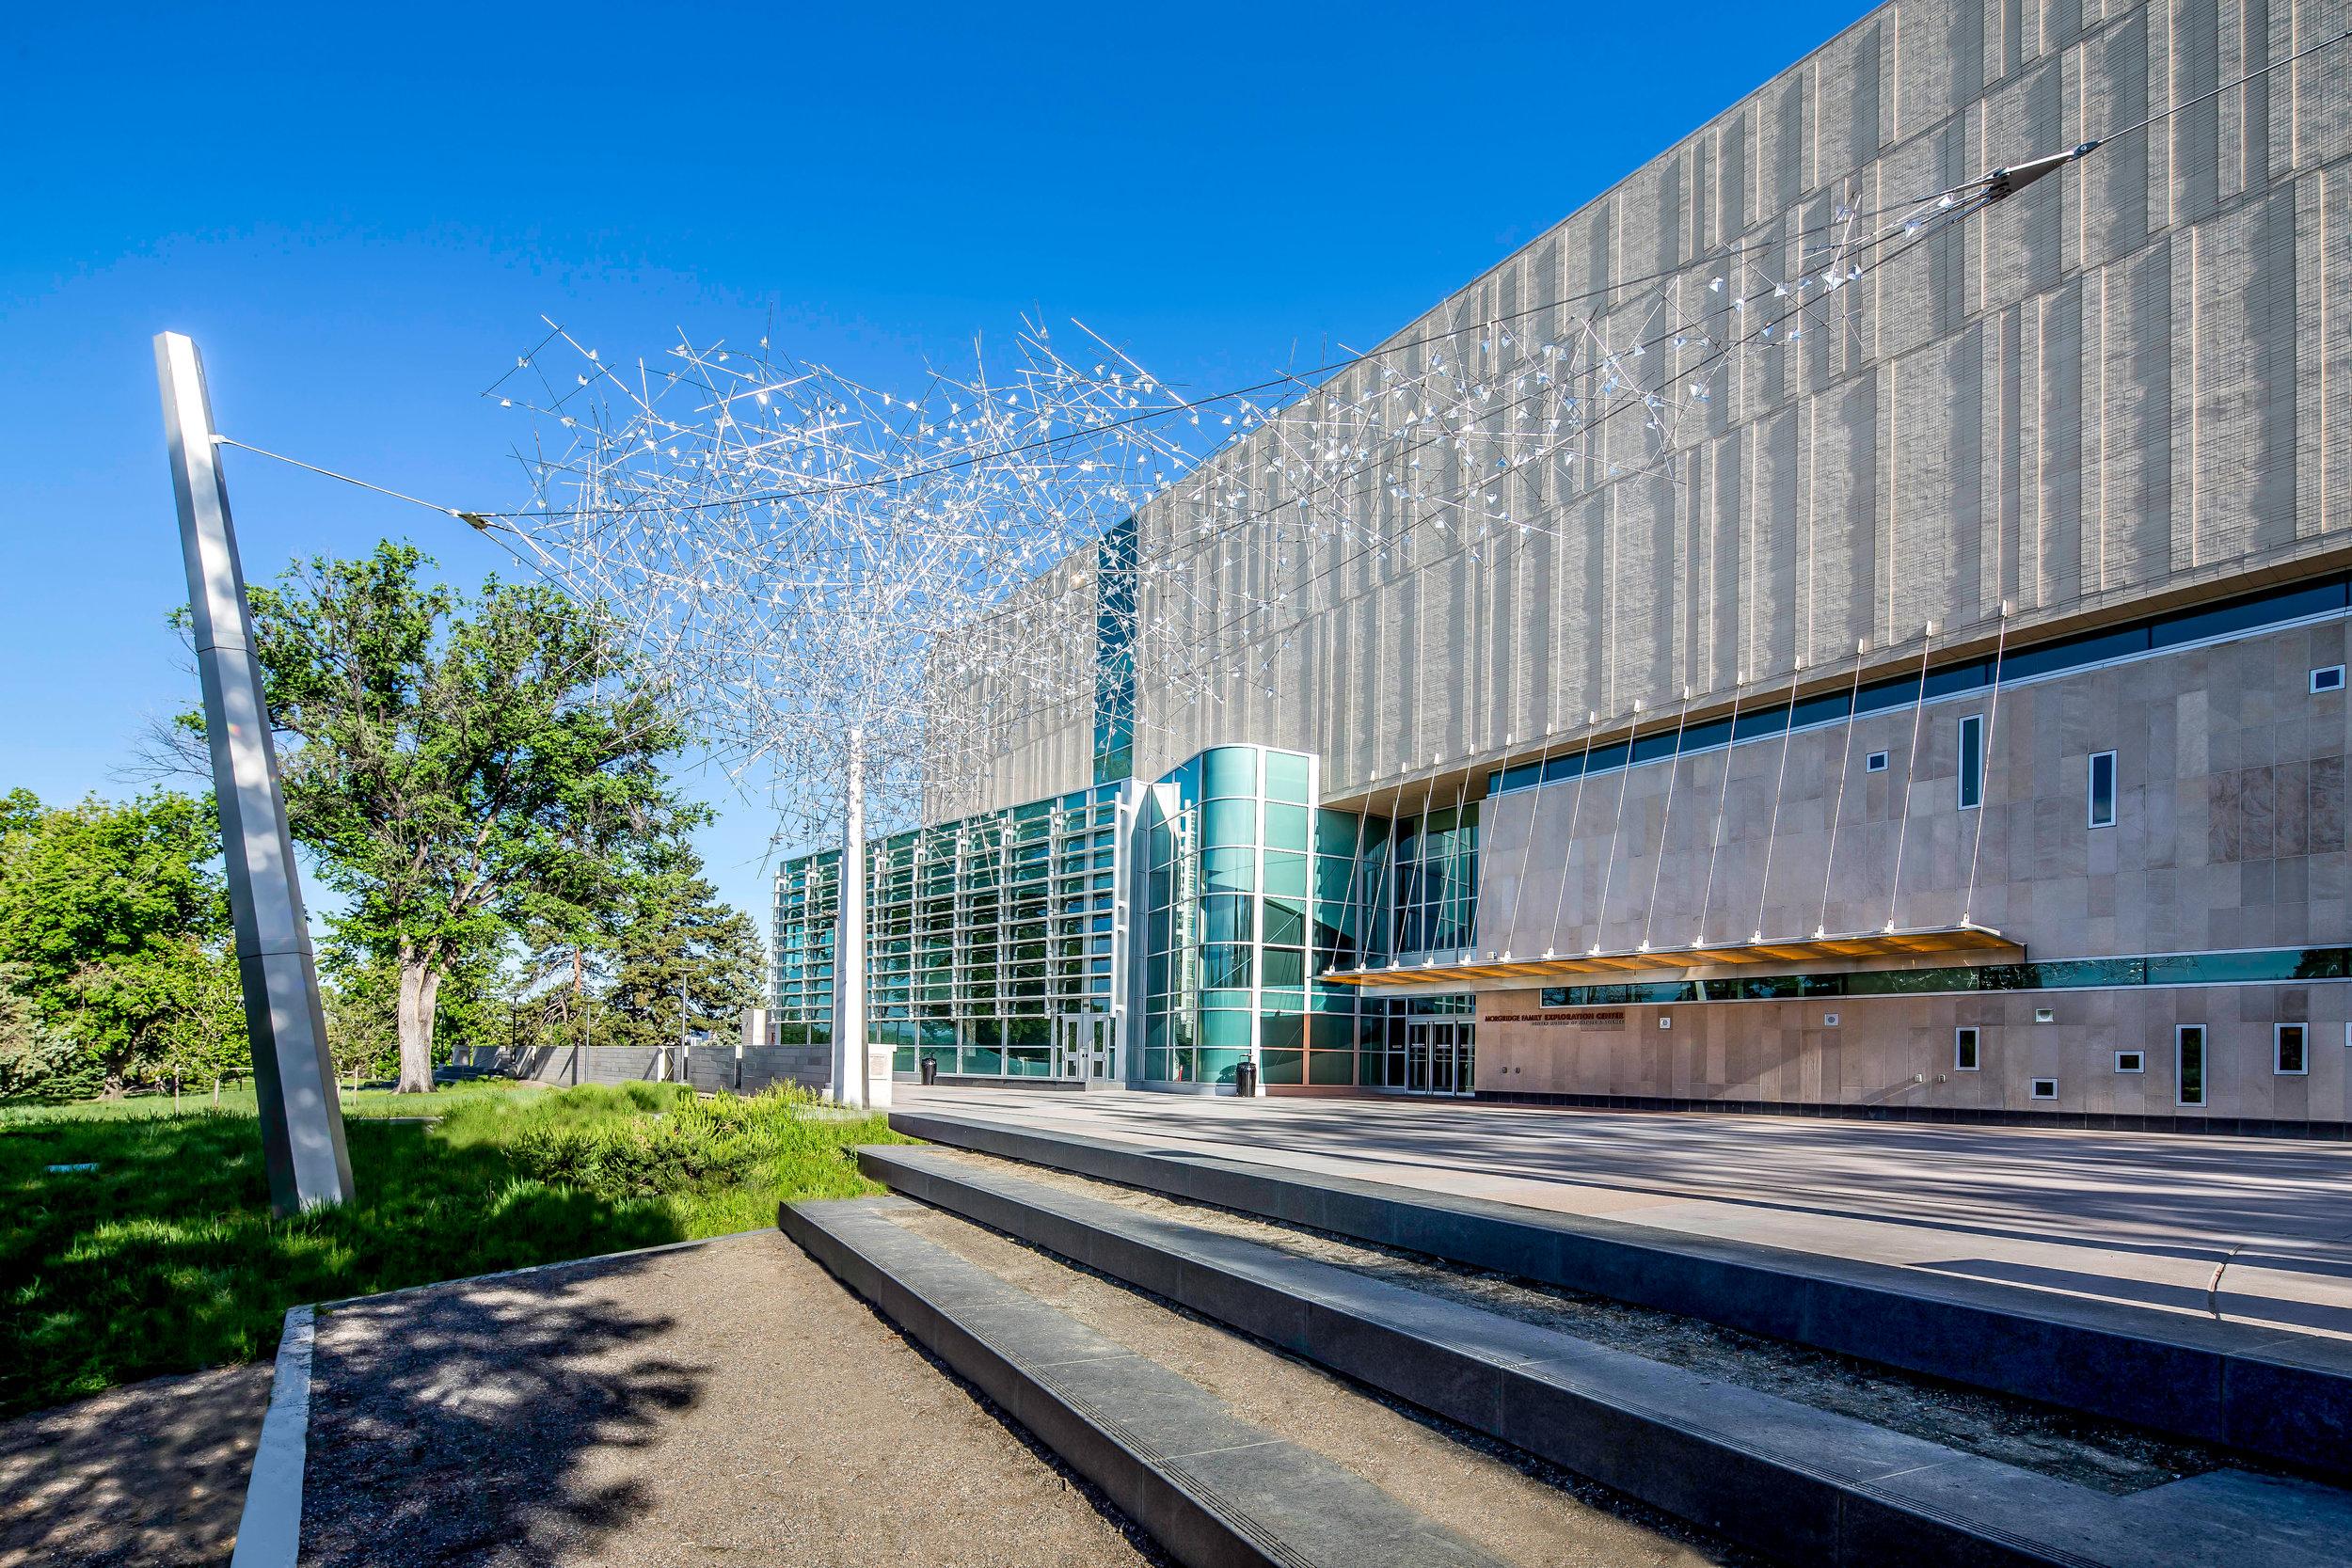 <f>Services</f><f>LandscapeArchitecture</f><f>Markets</f><f>Civic+Cultural</f><t>Denver Museum of <br>Nature and Science</t><m>Denver, CO</m>